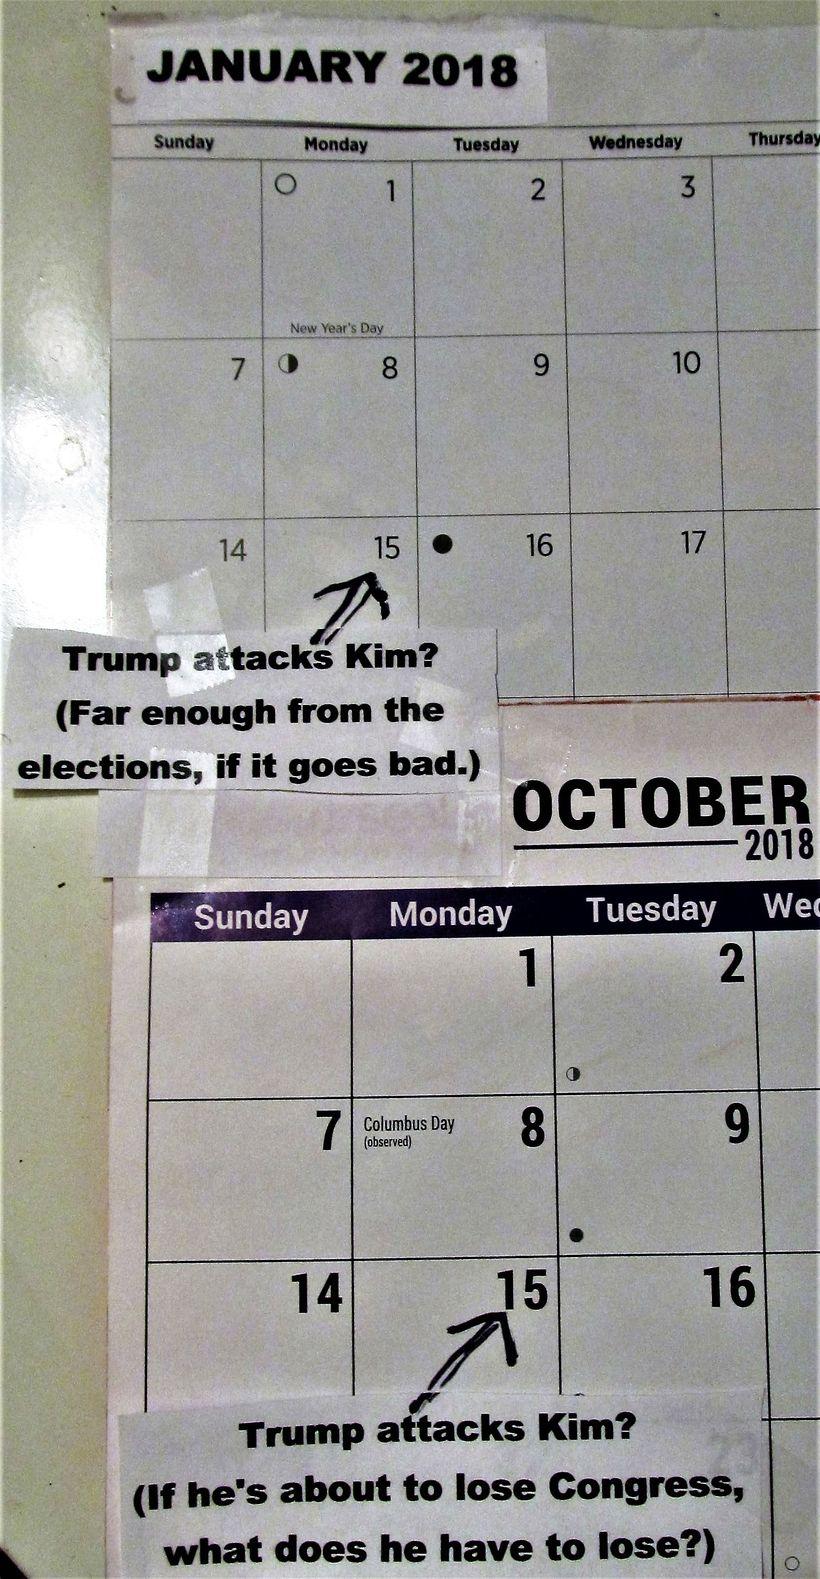 Donald Trump's 2018 calendar?